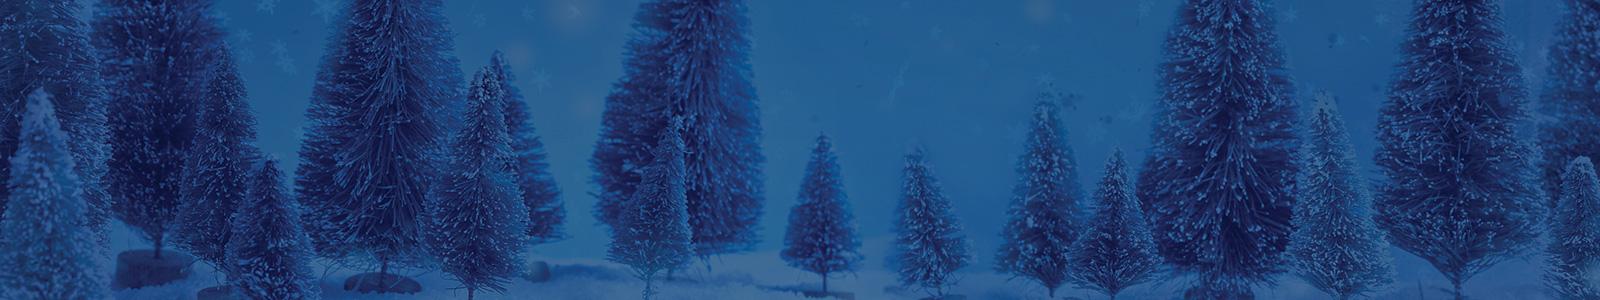 WestJet Christmas Miracle | WestJet